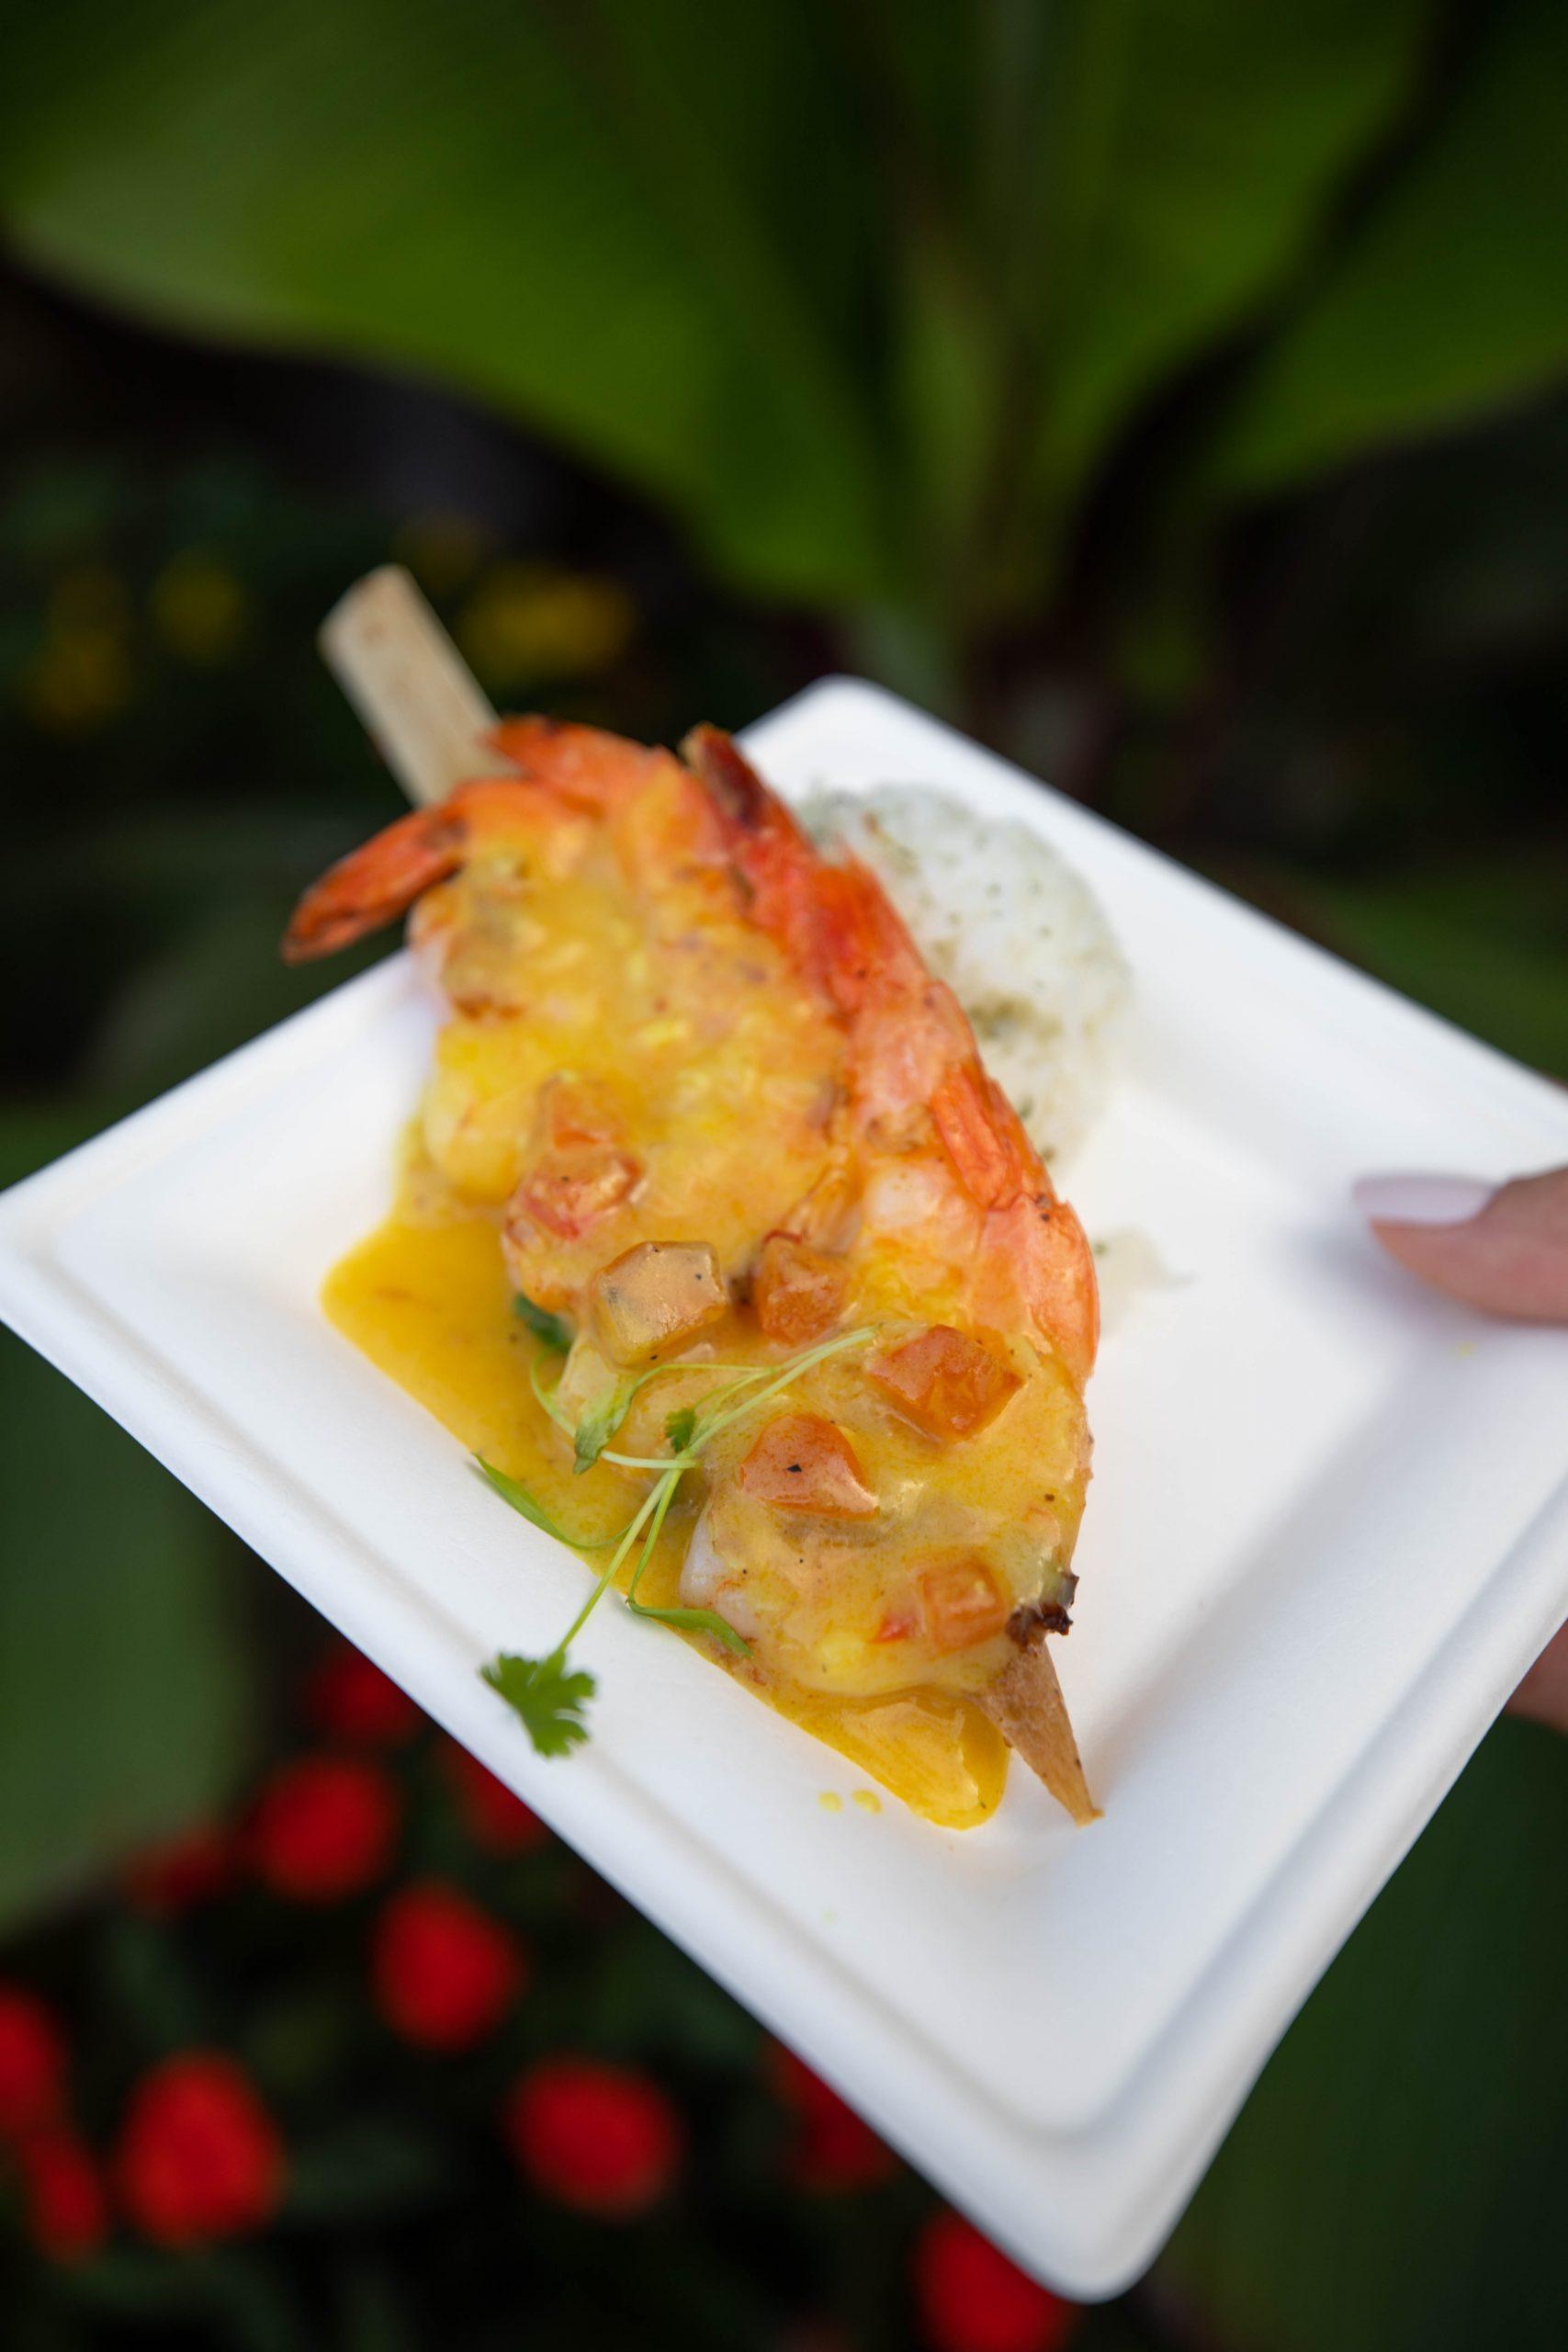 Sugar Cane Shrimp Skewer from La Isla Fresca between Morocco and France at Epcot in Walt Disney World Orlando Florida Photographed by Annie Fairfax